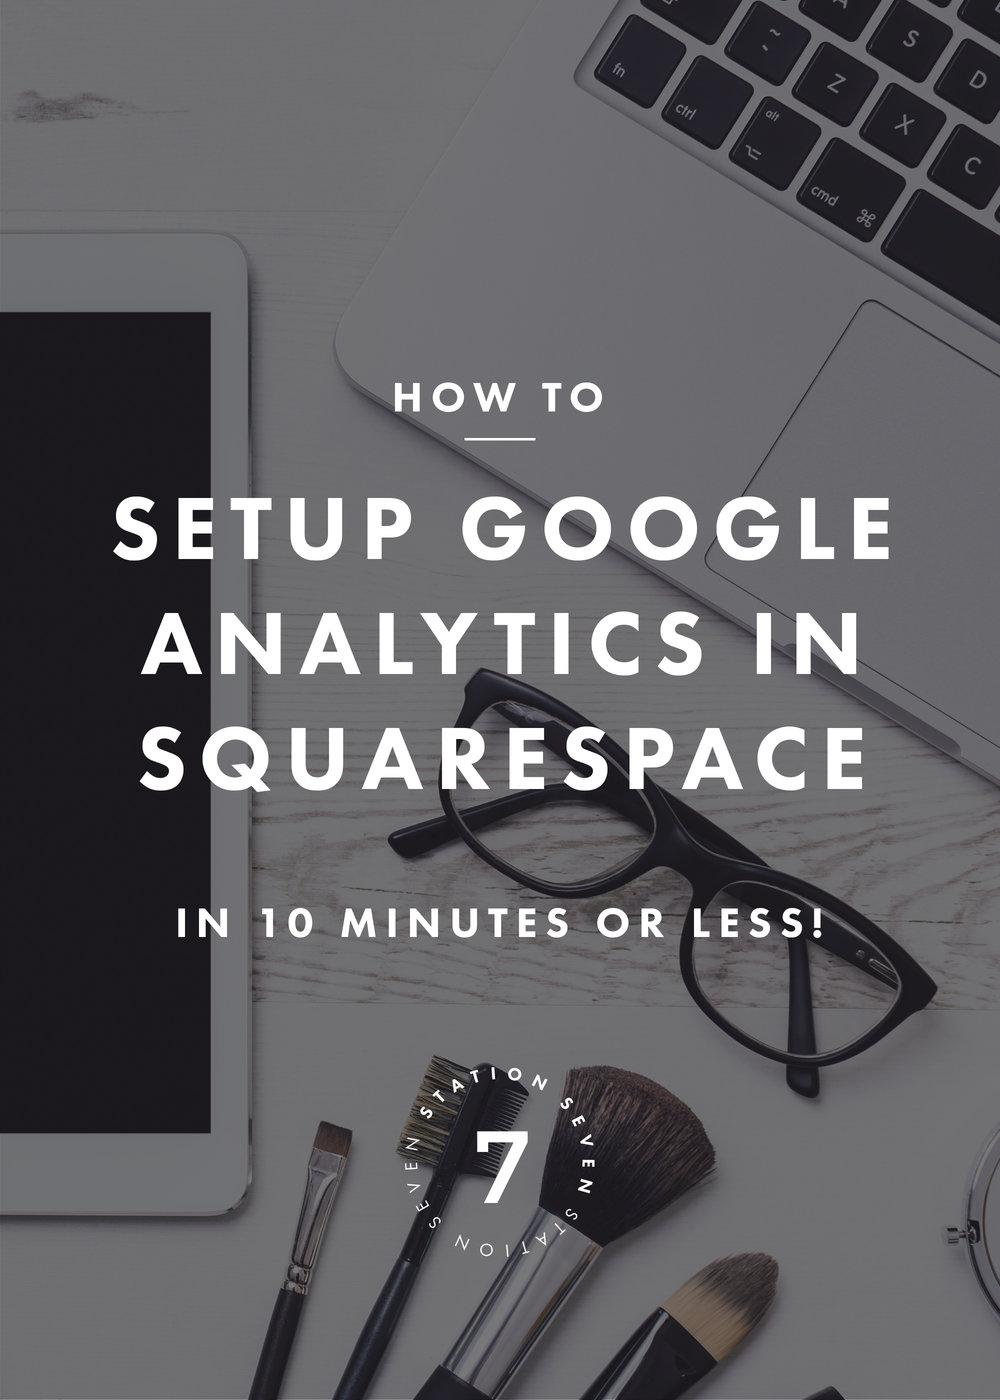 googlesquarespace.jpg